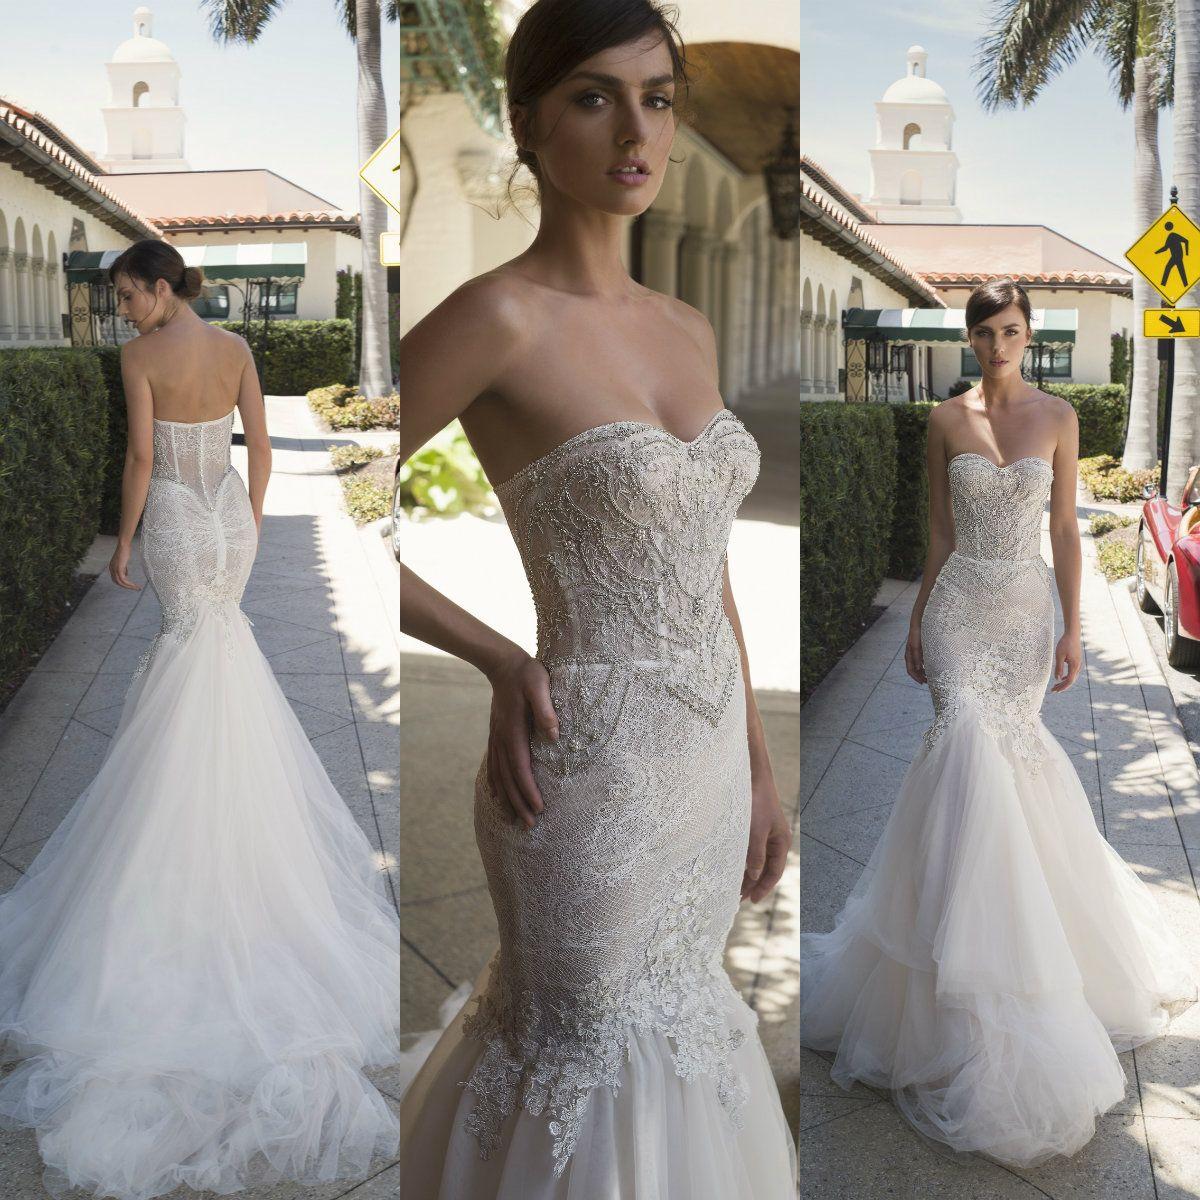 2019 Netta Ben Shabu Wedding Dresses Strapless